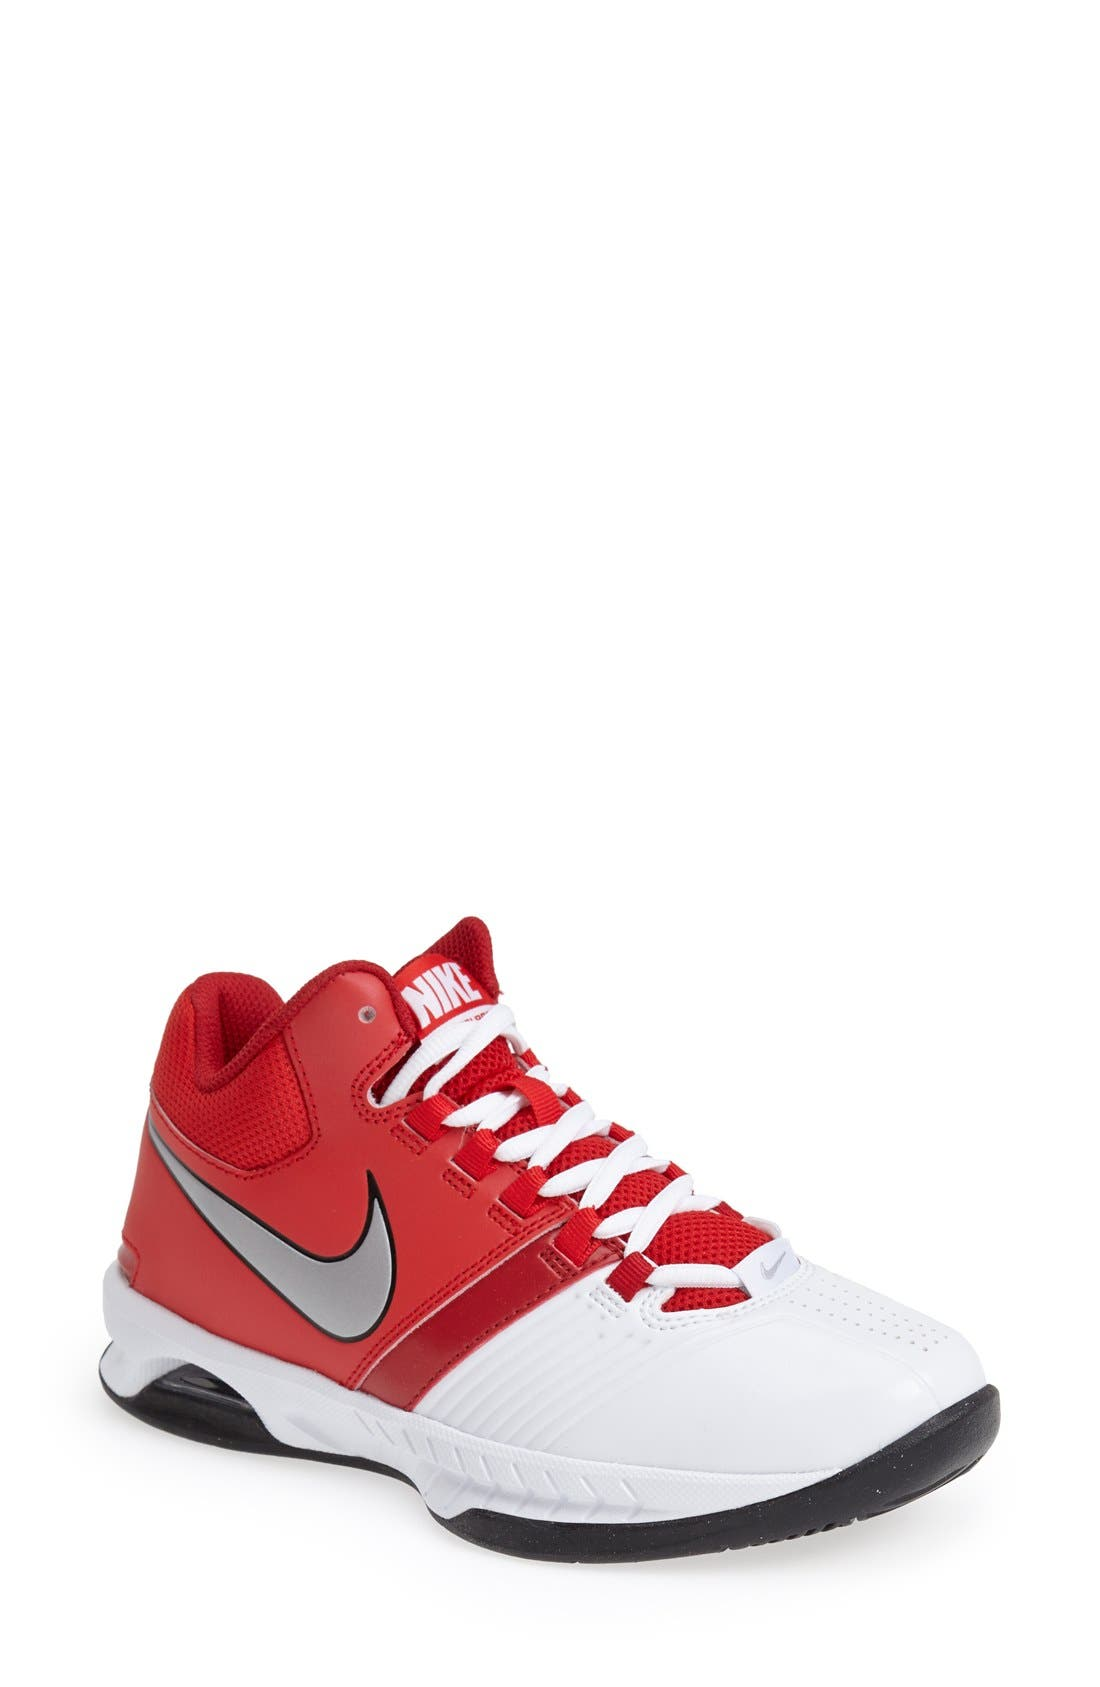 Alternate Image 1 Selected - Nike 'Air Visi Pro V' Basketball Shoe (Women)